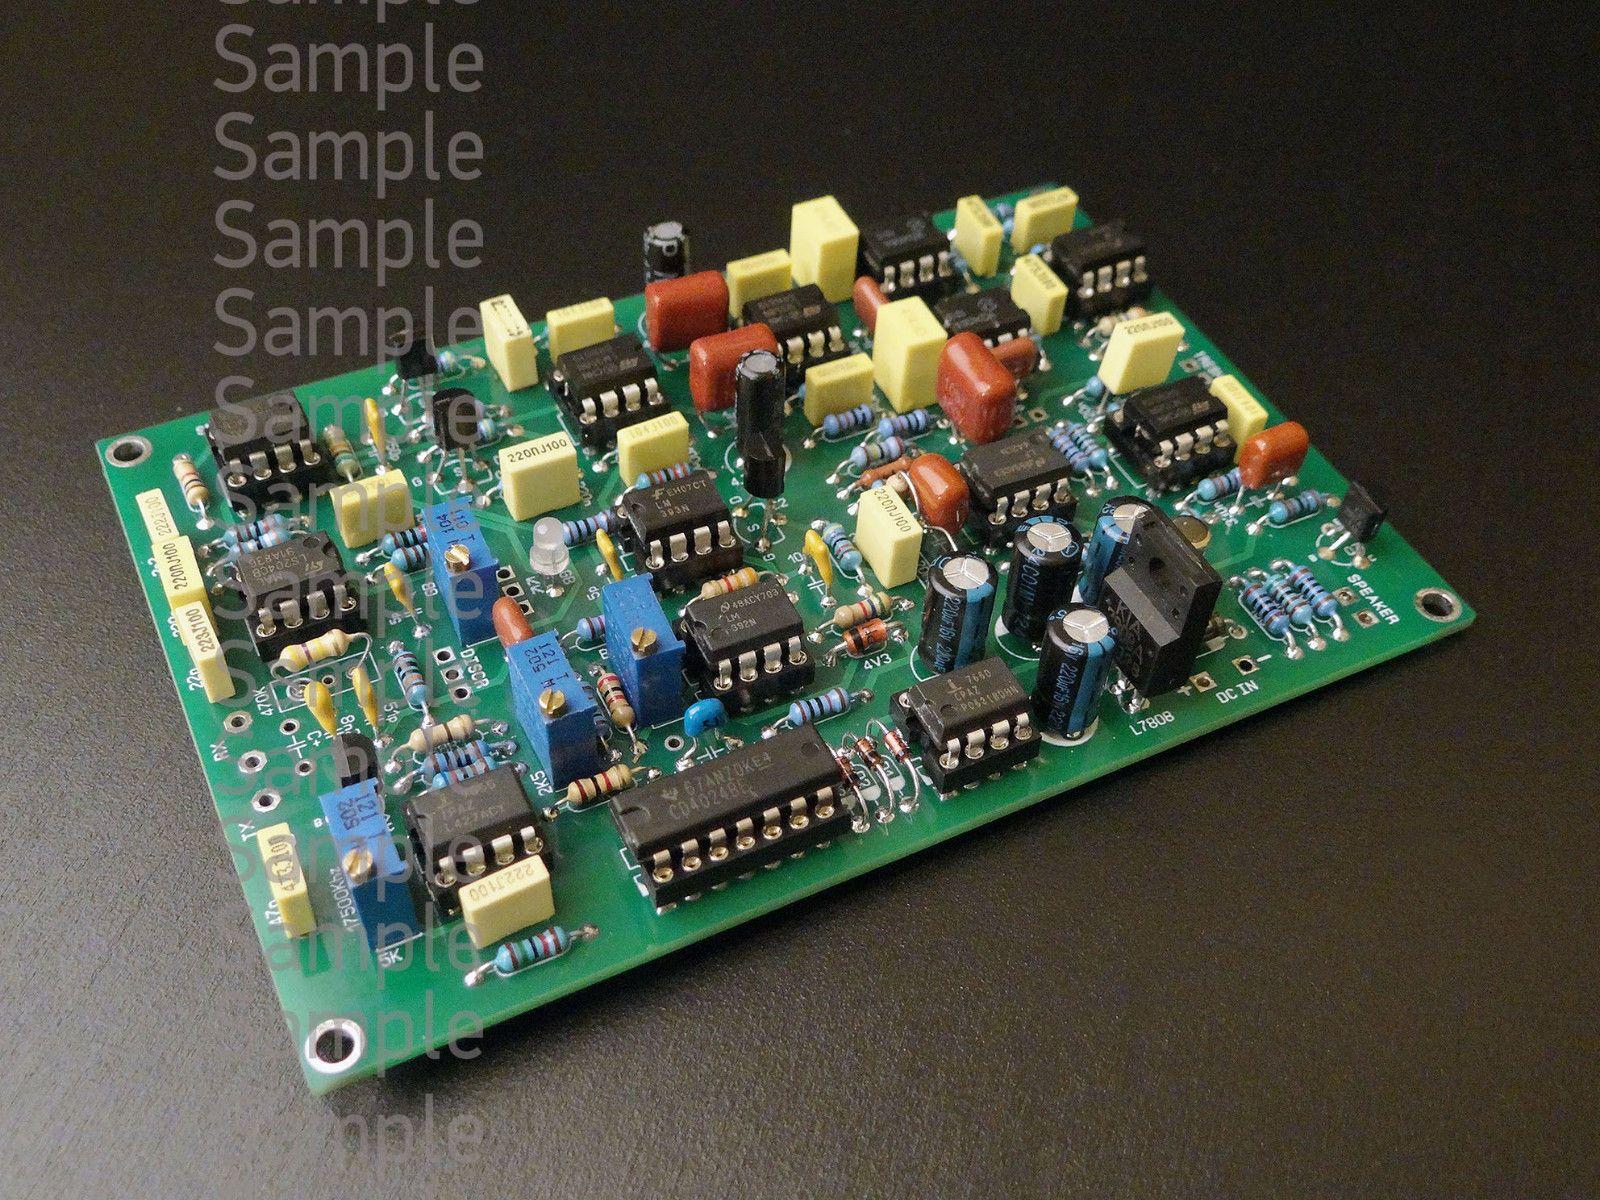 Metal Detector Tesoro Lobo Diy Only Pcb 1pc 765573987522 Ebay